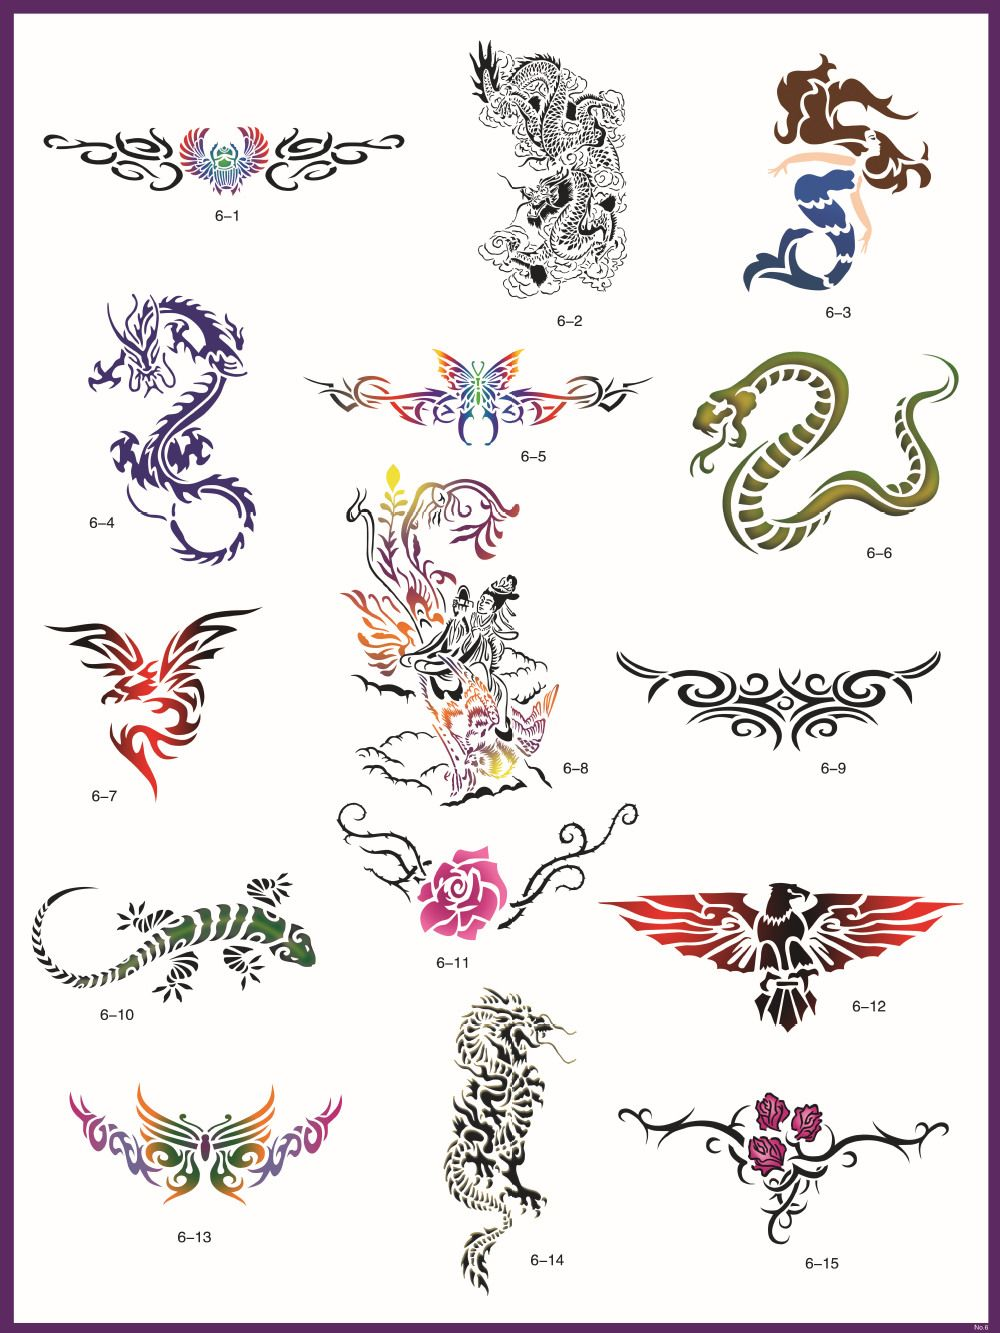 Books Reusable Airbrush Temporary Tattoo Stencils Books Kit - 24 ...